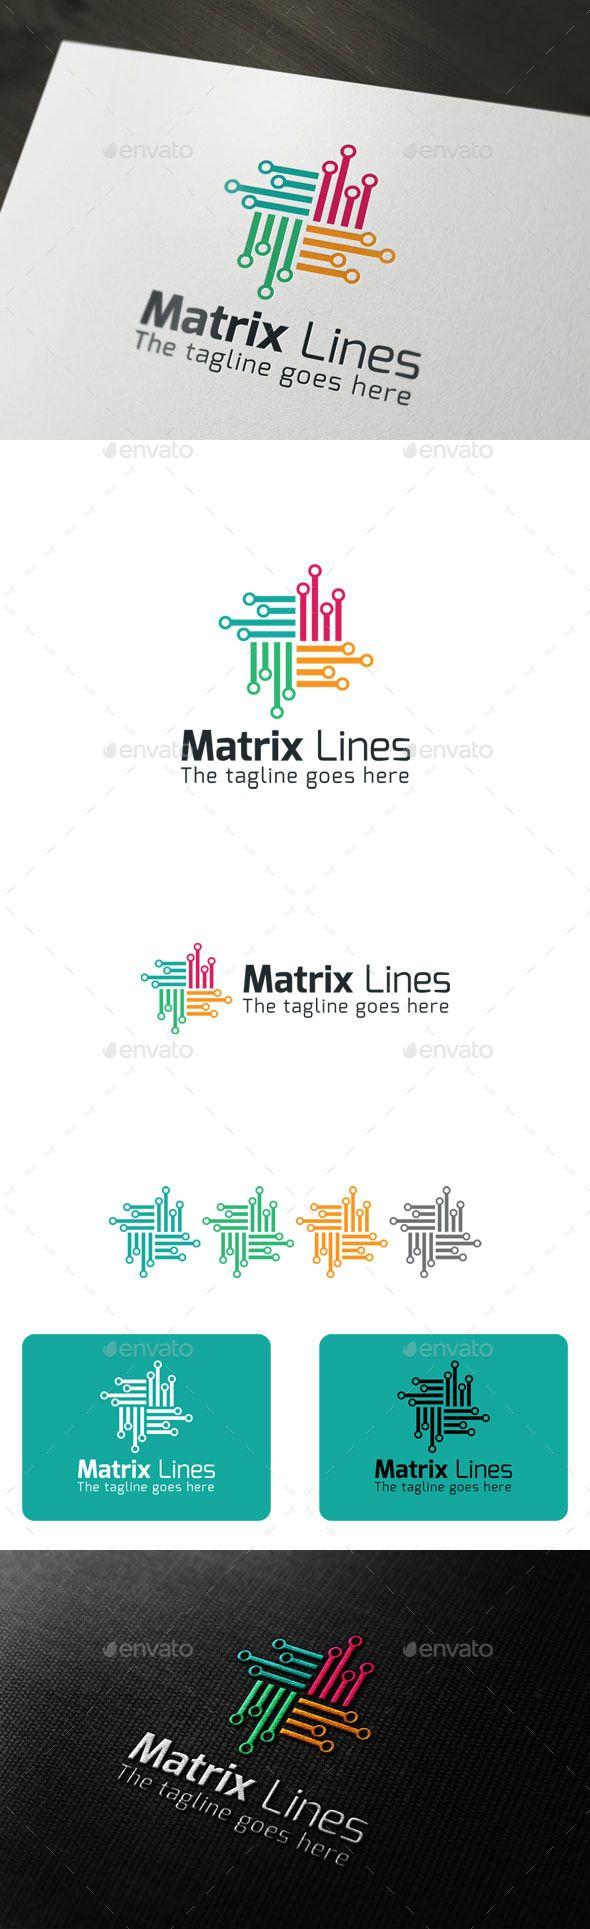 Matrix Lines - Logo Design Template Vector #logotype Download it here: http://graphicriver.net/item/matrix-lines/9700894?s_rank=1494?ref=nexion